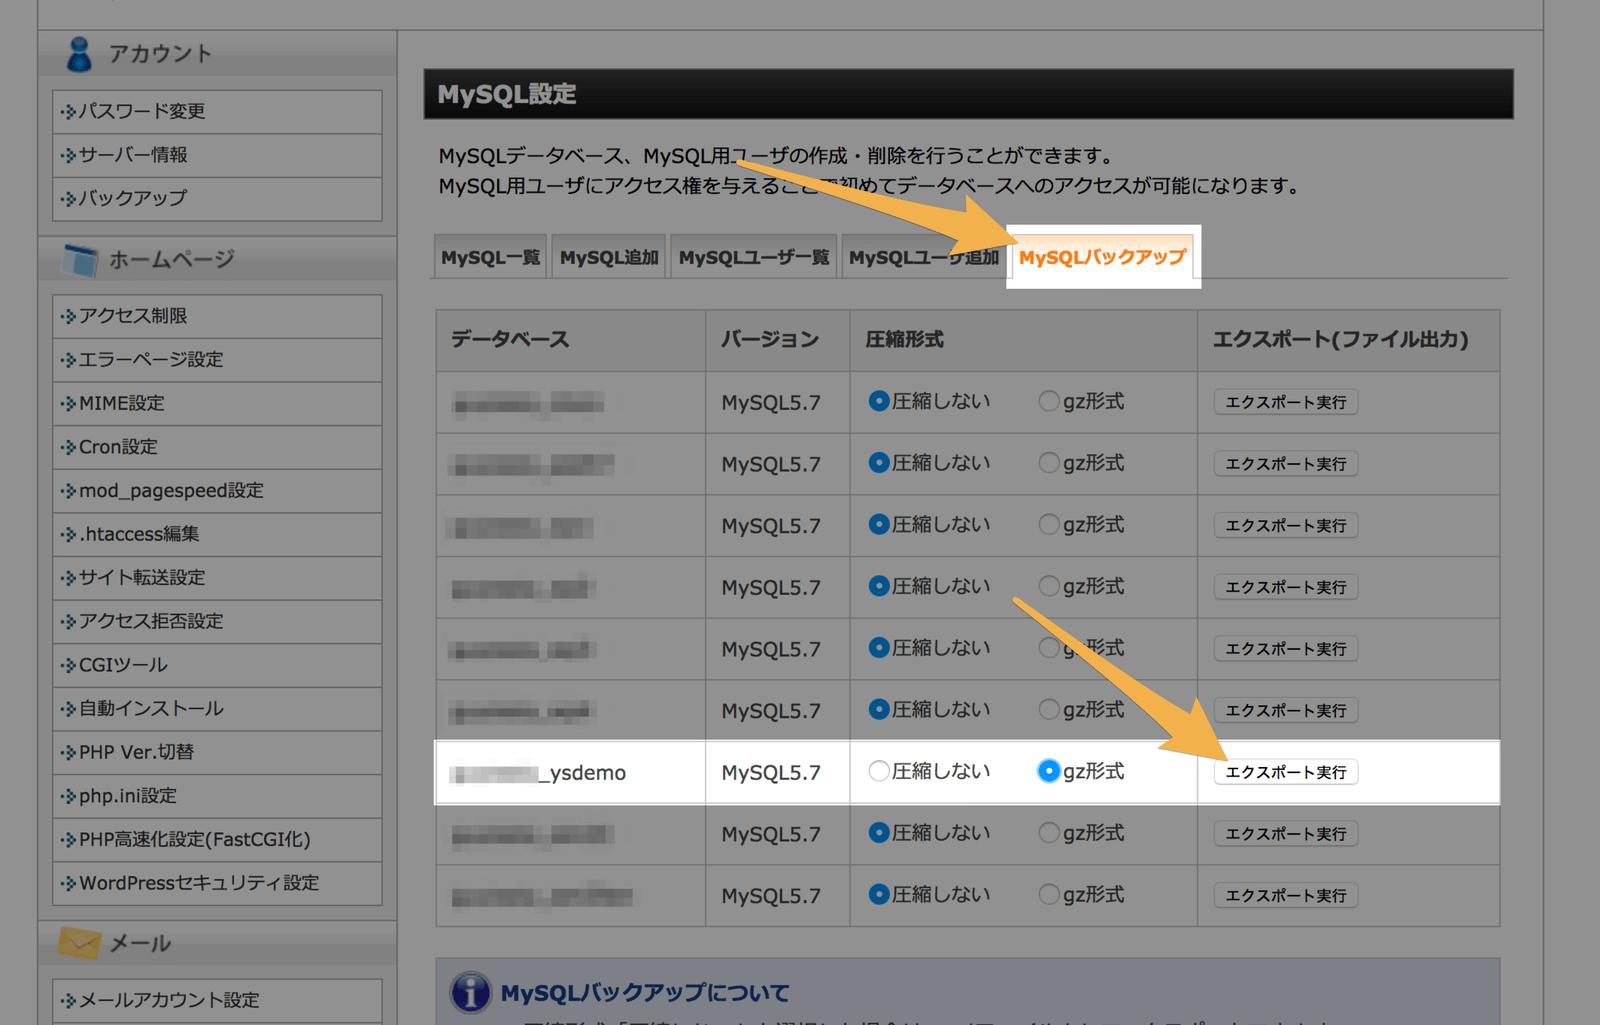 MySQLバックアップからバックアップしたいDBを選んでエクスポート